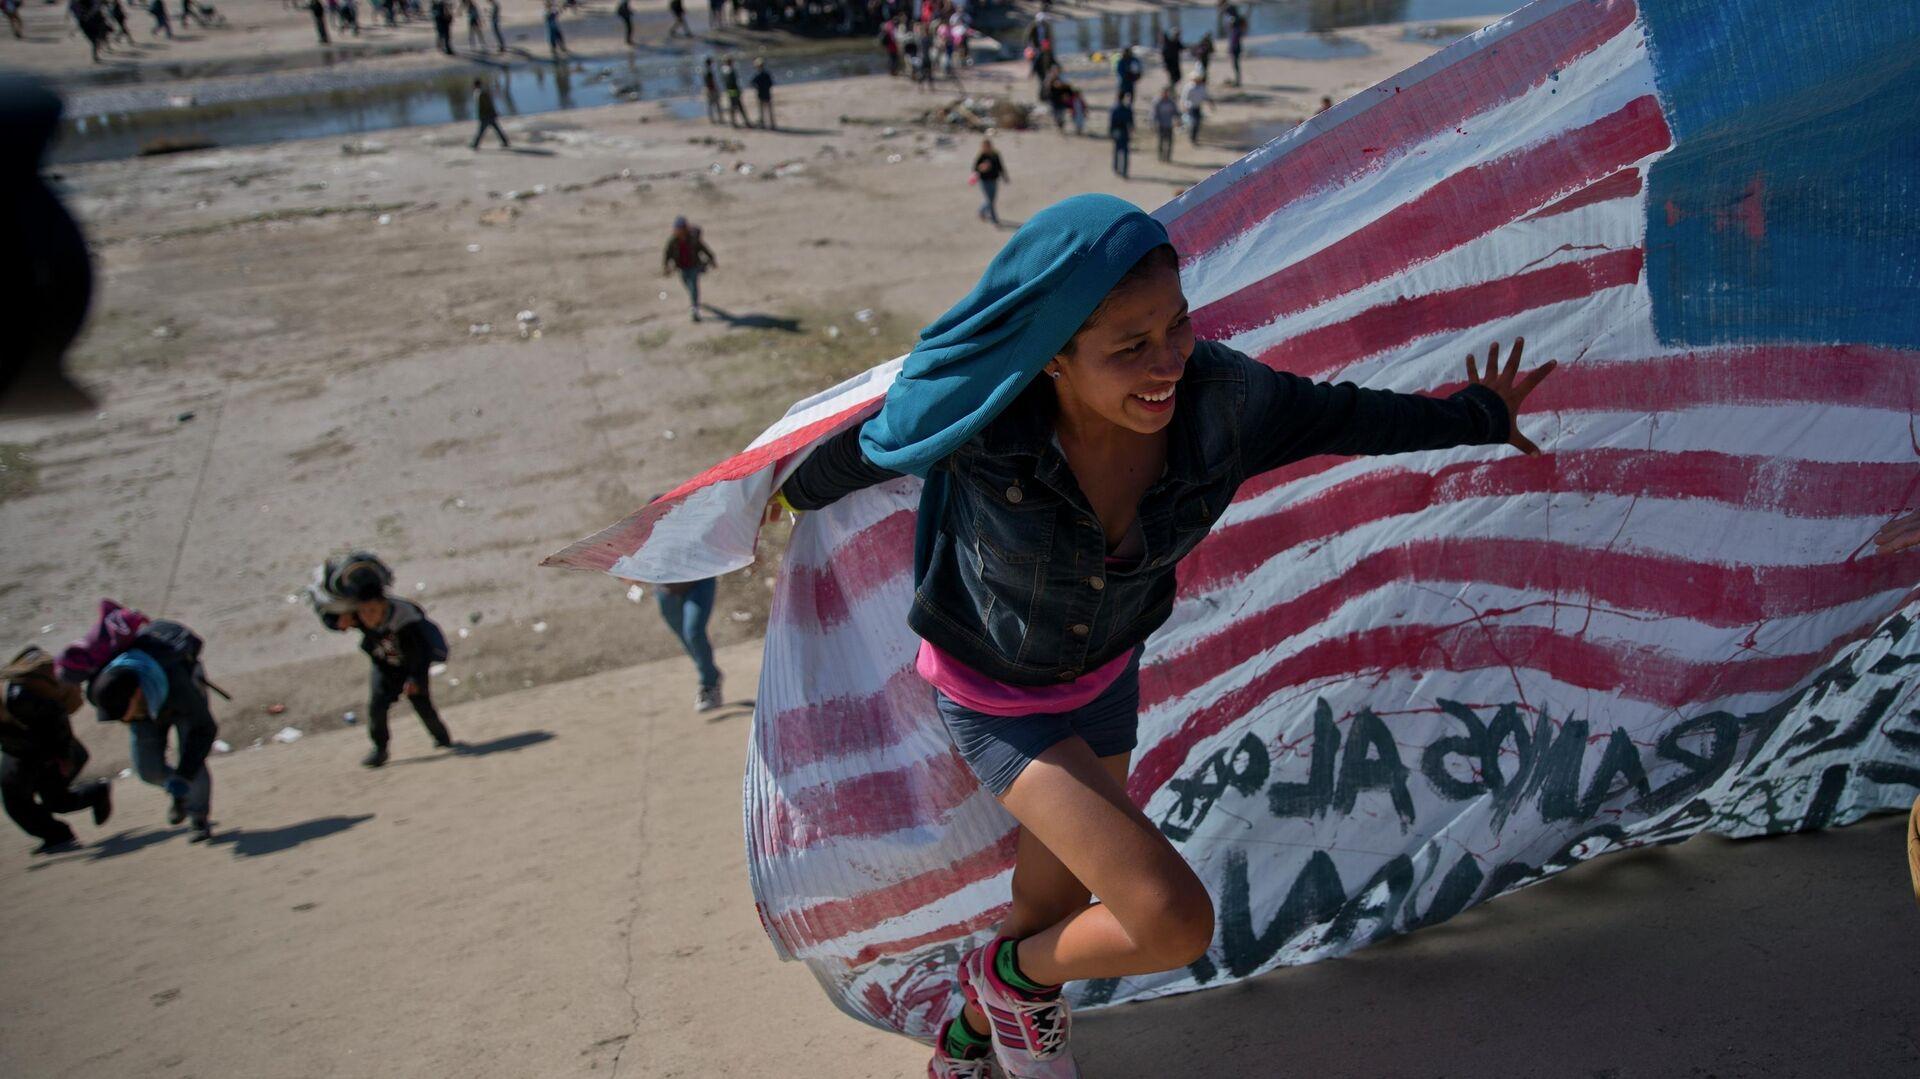 Мигрантка помогает нести американский флаг на границе Мексики и США - РИА Новости, 1920, 19.01.2021